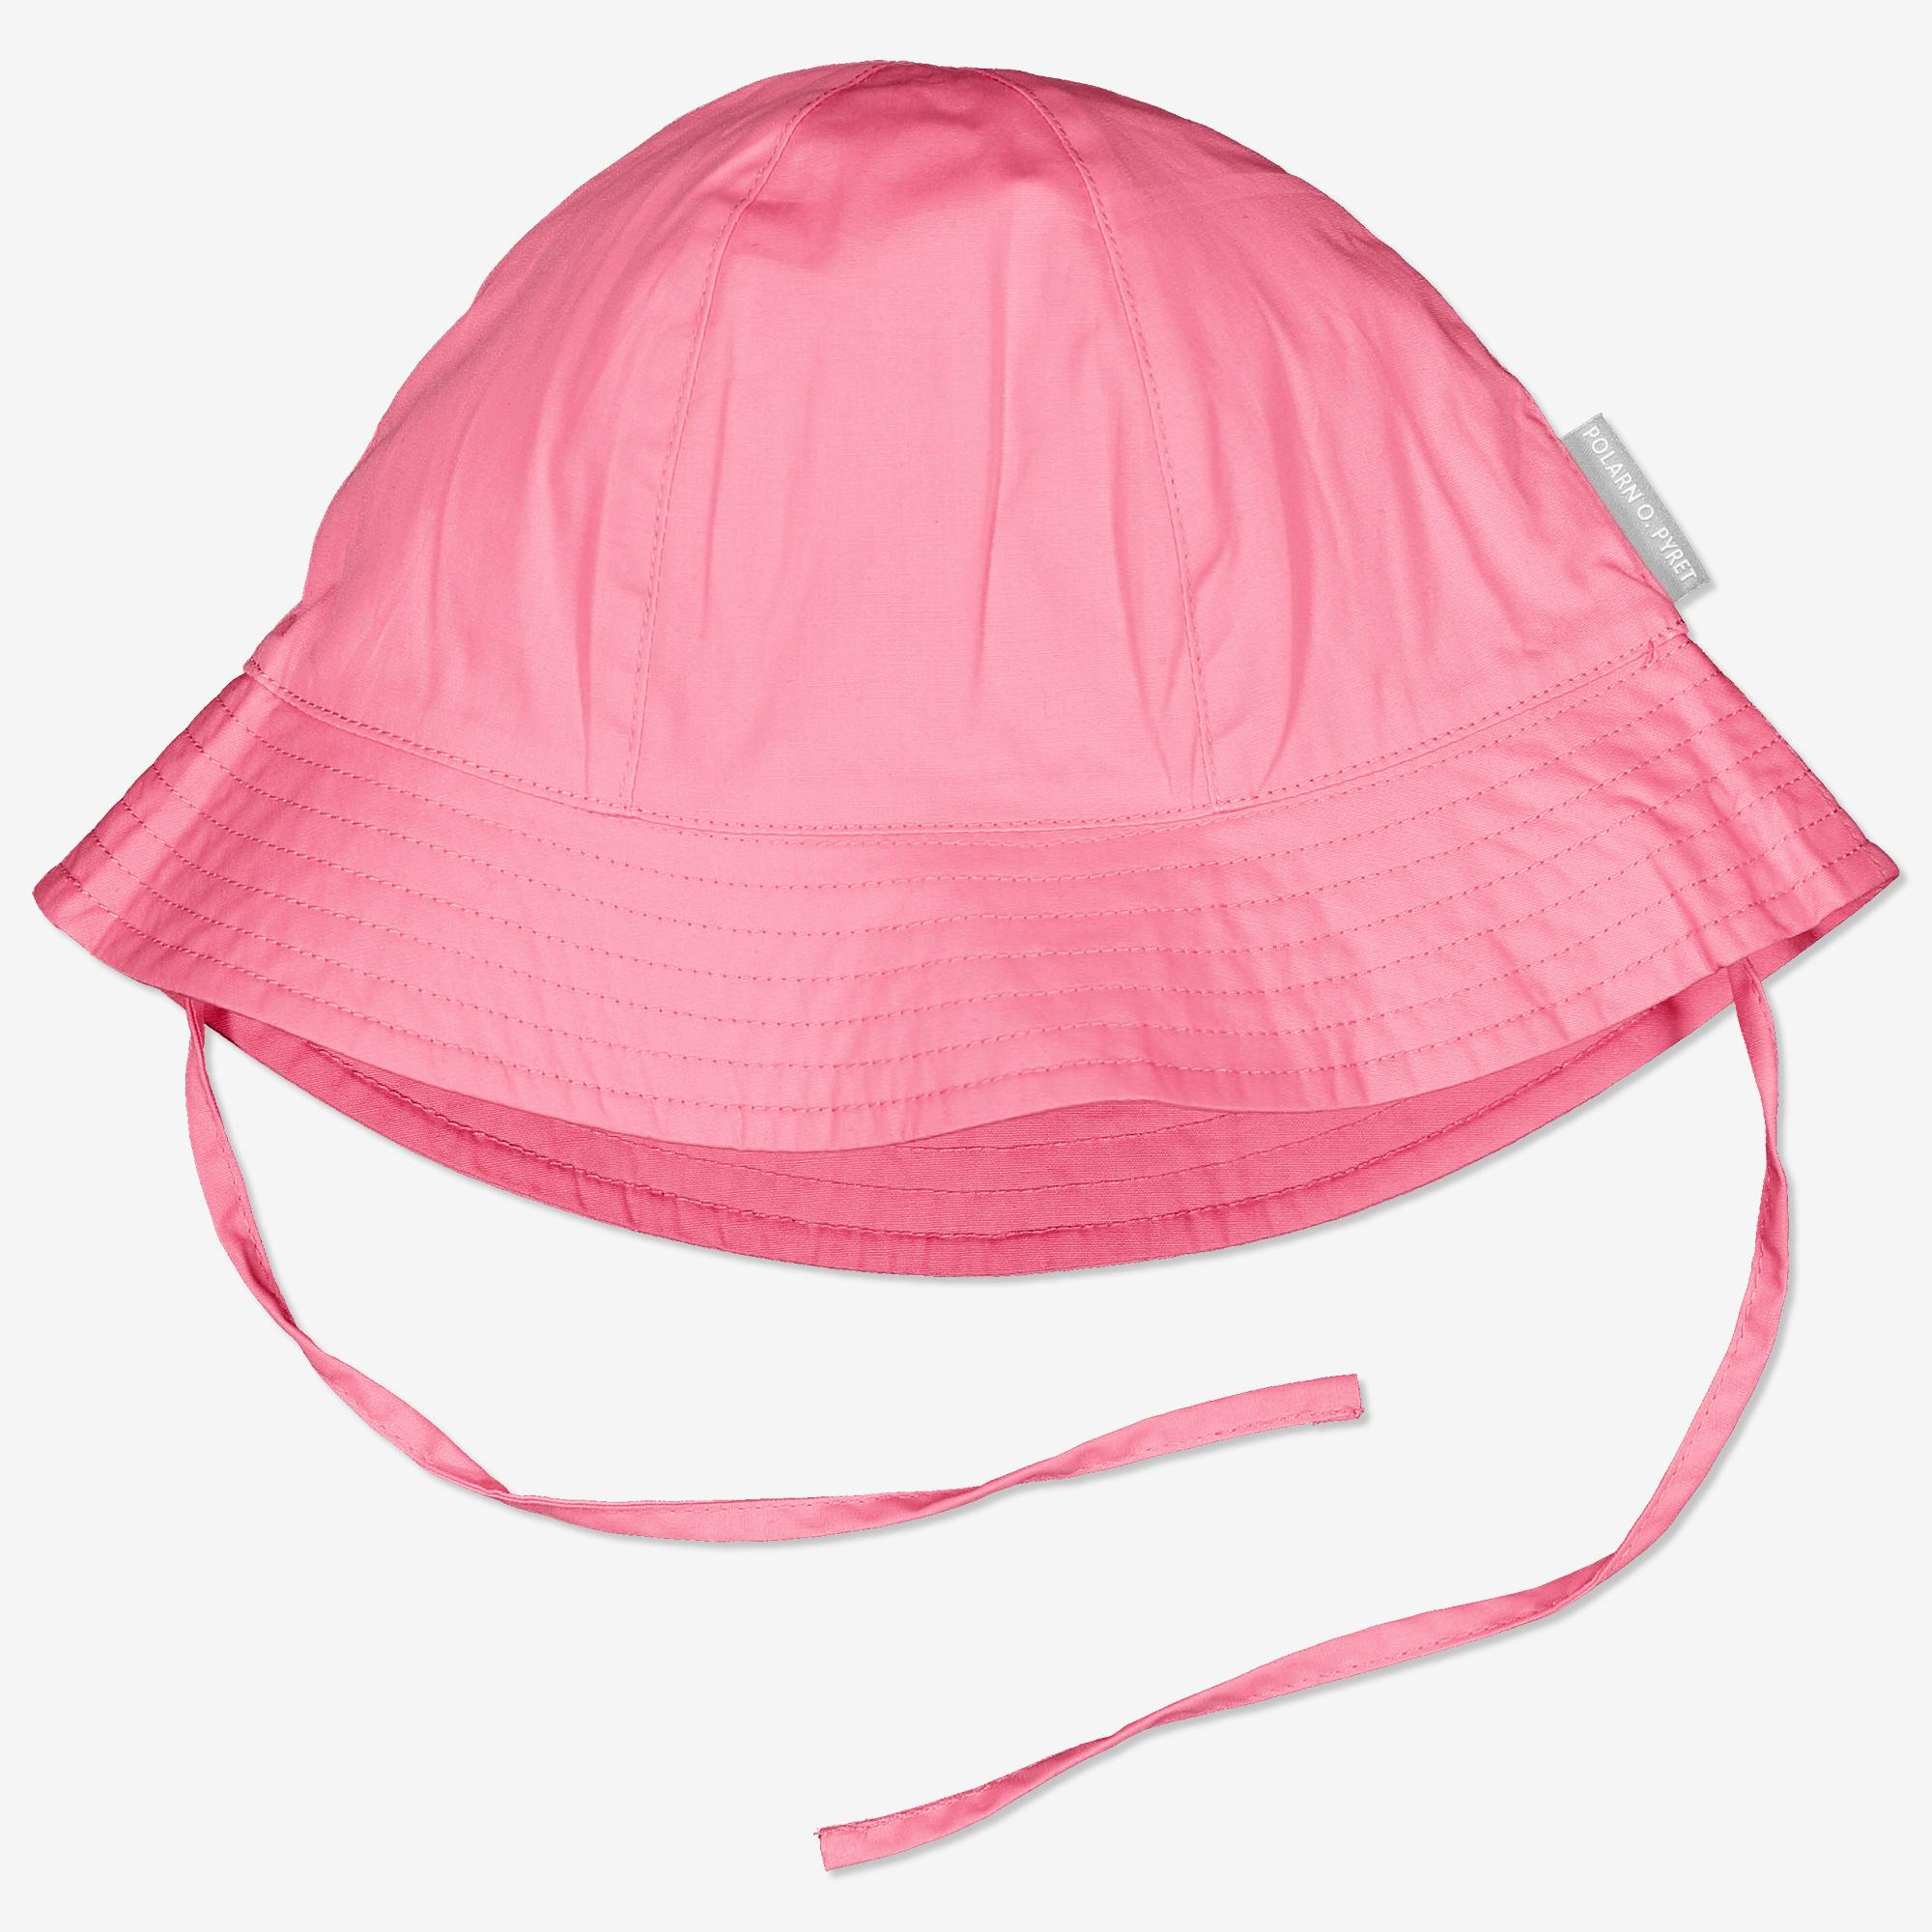 Vauvan aurinkohattu uv-suojalla pinkki 091b97b245